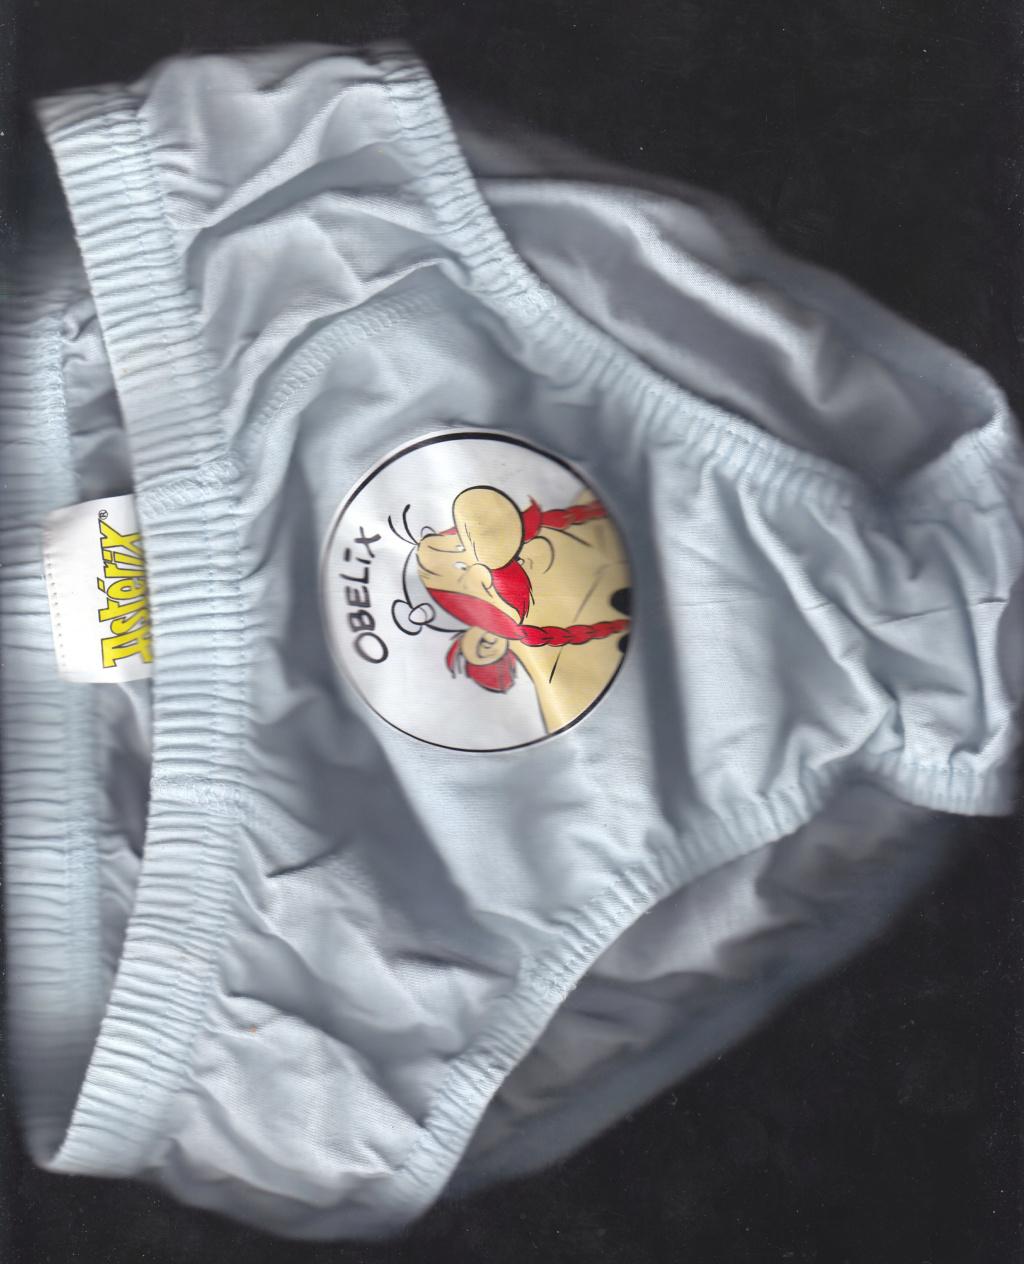 2003_s12.jpg